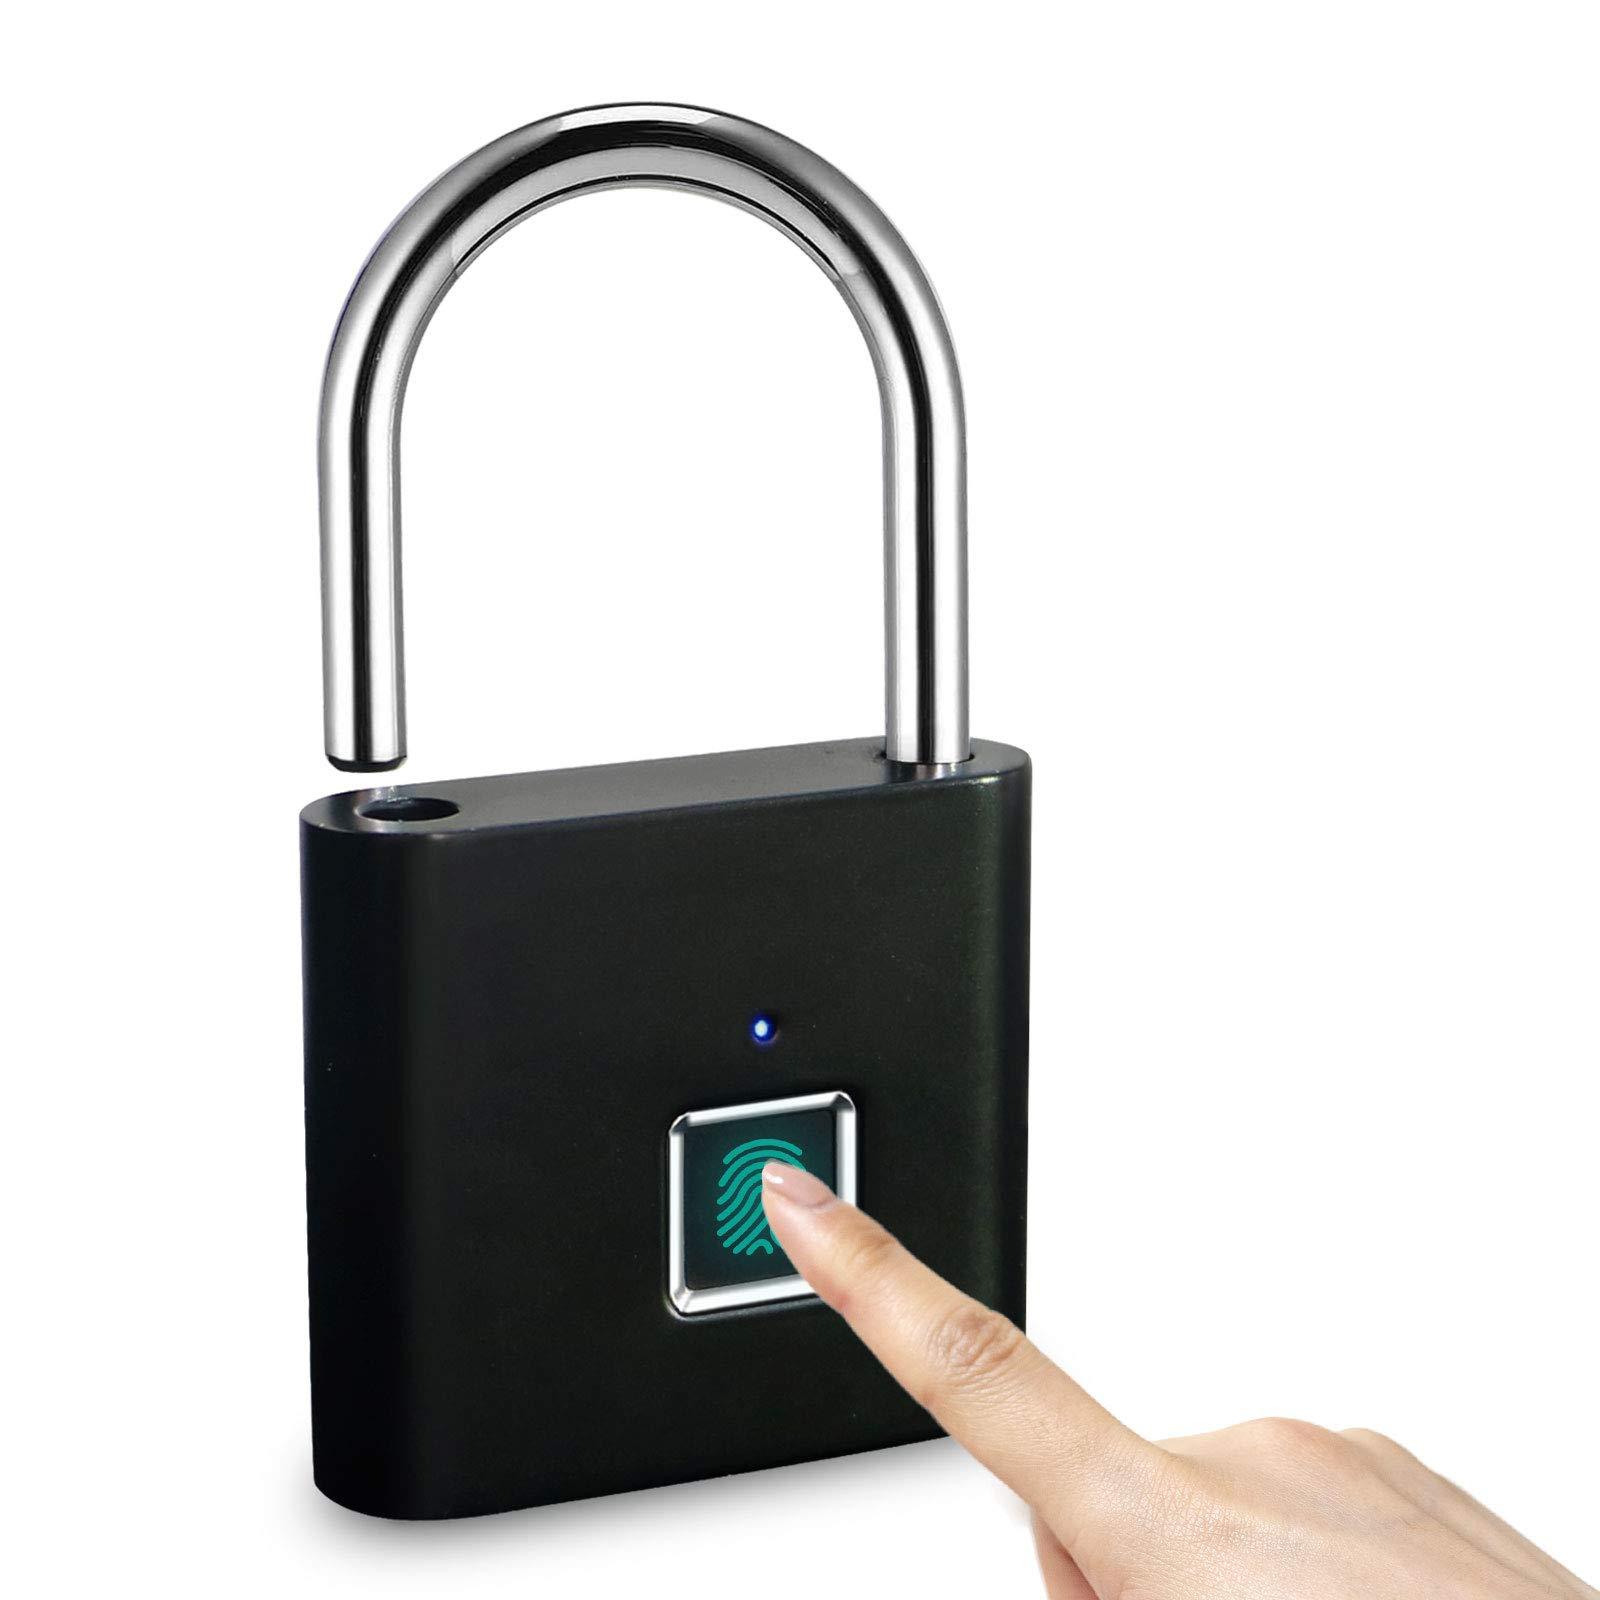 LANDYE Fingerprint Padlock Locker Lock, Smart Pad Lock Waterproof Small Portable Biometric Padlock with USB Charging for Locker,Luggage, Gym , Suitcas